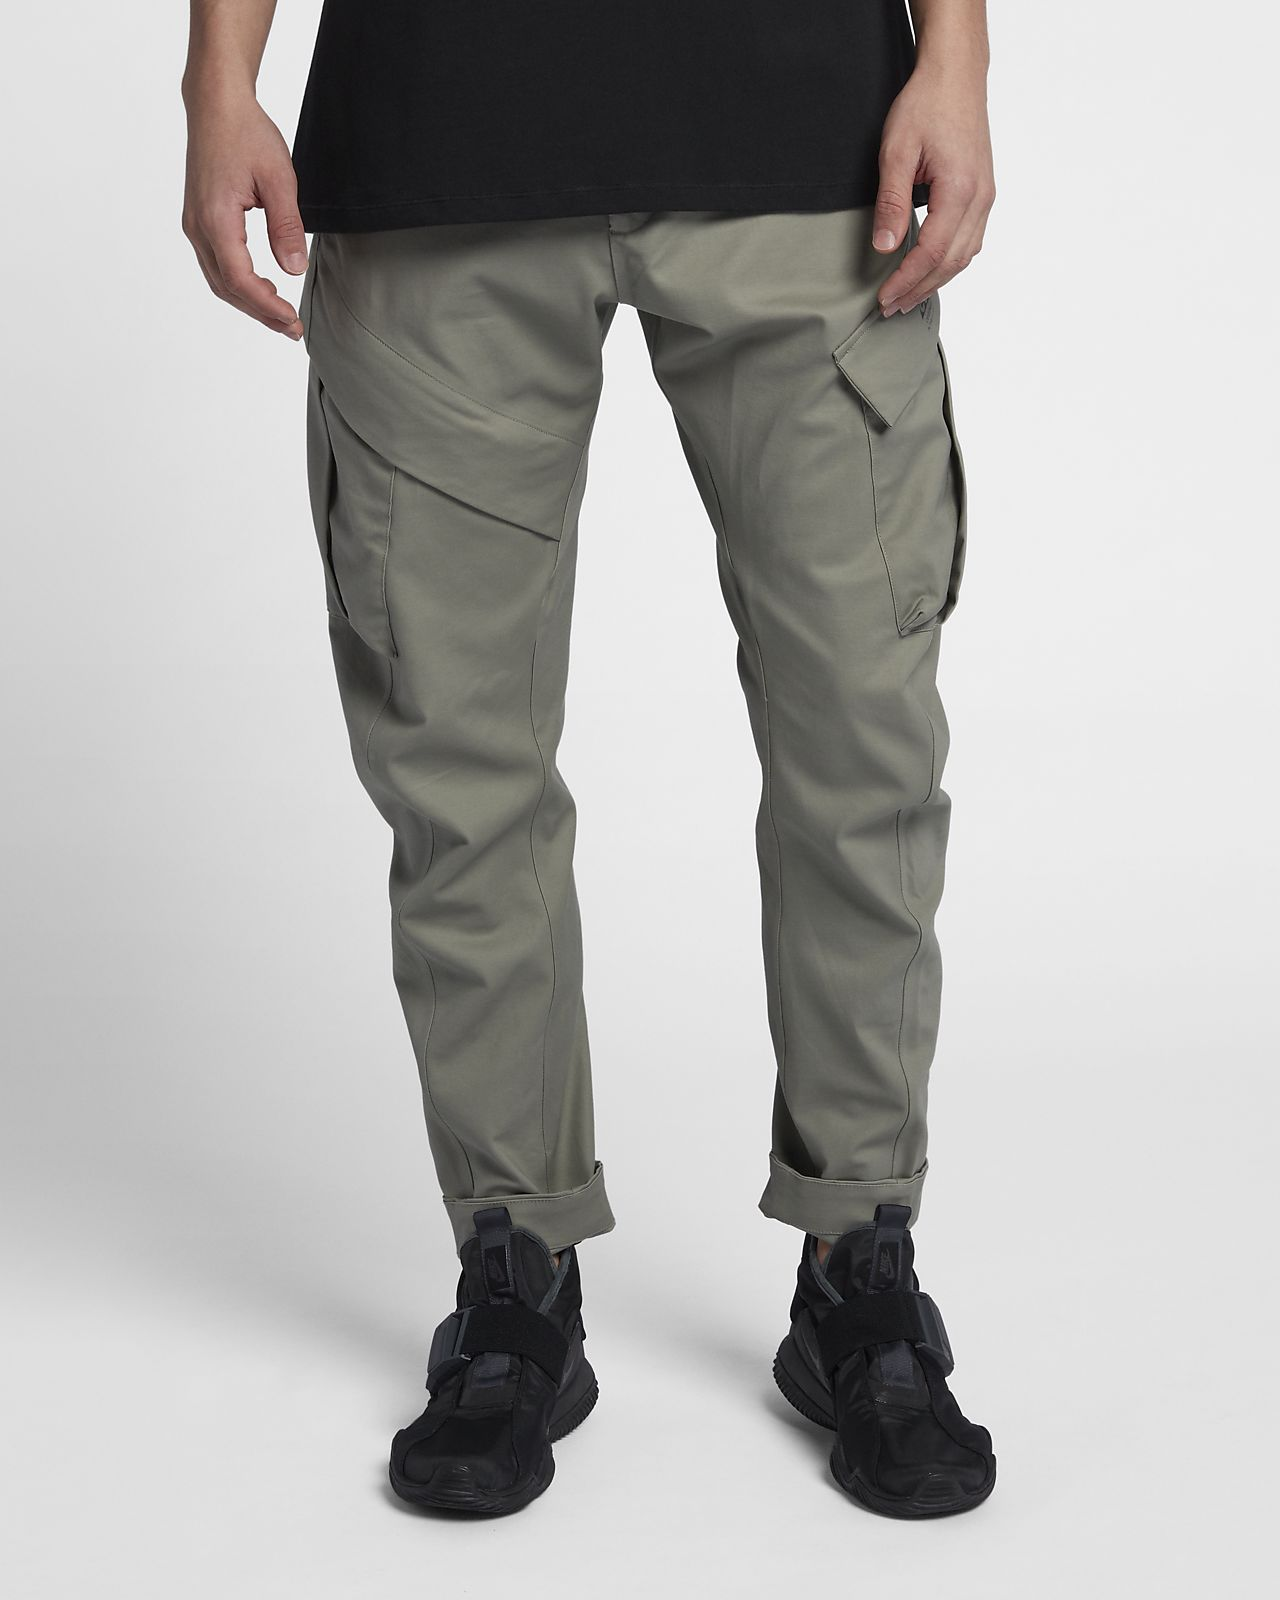 NikeLab ACG Cargo Men's Trousers